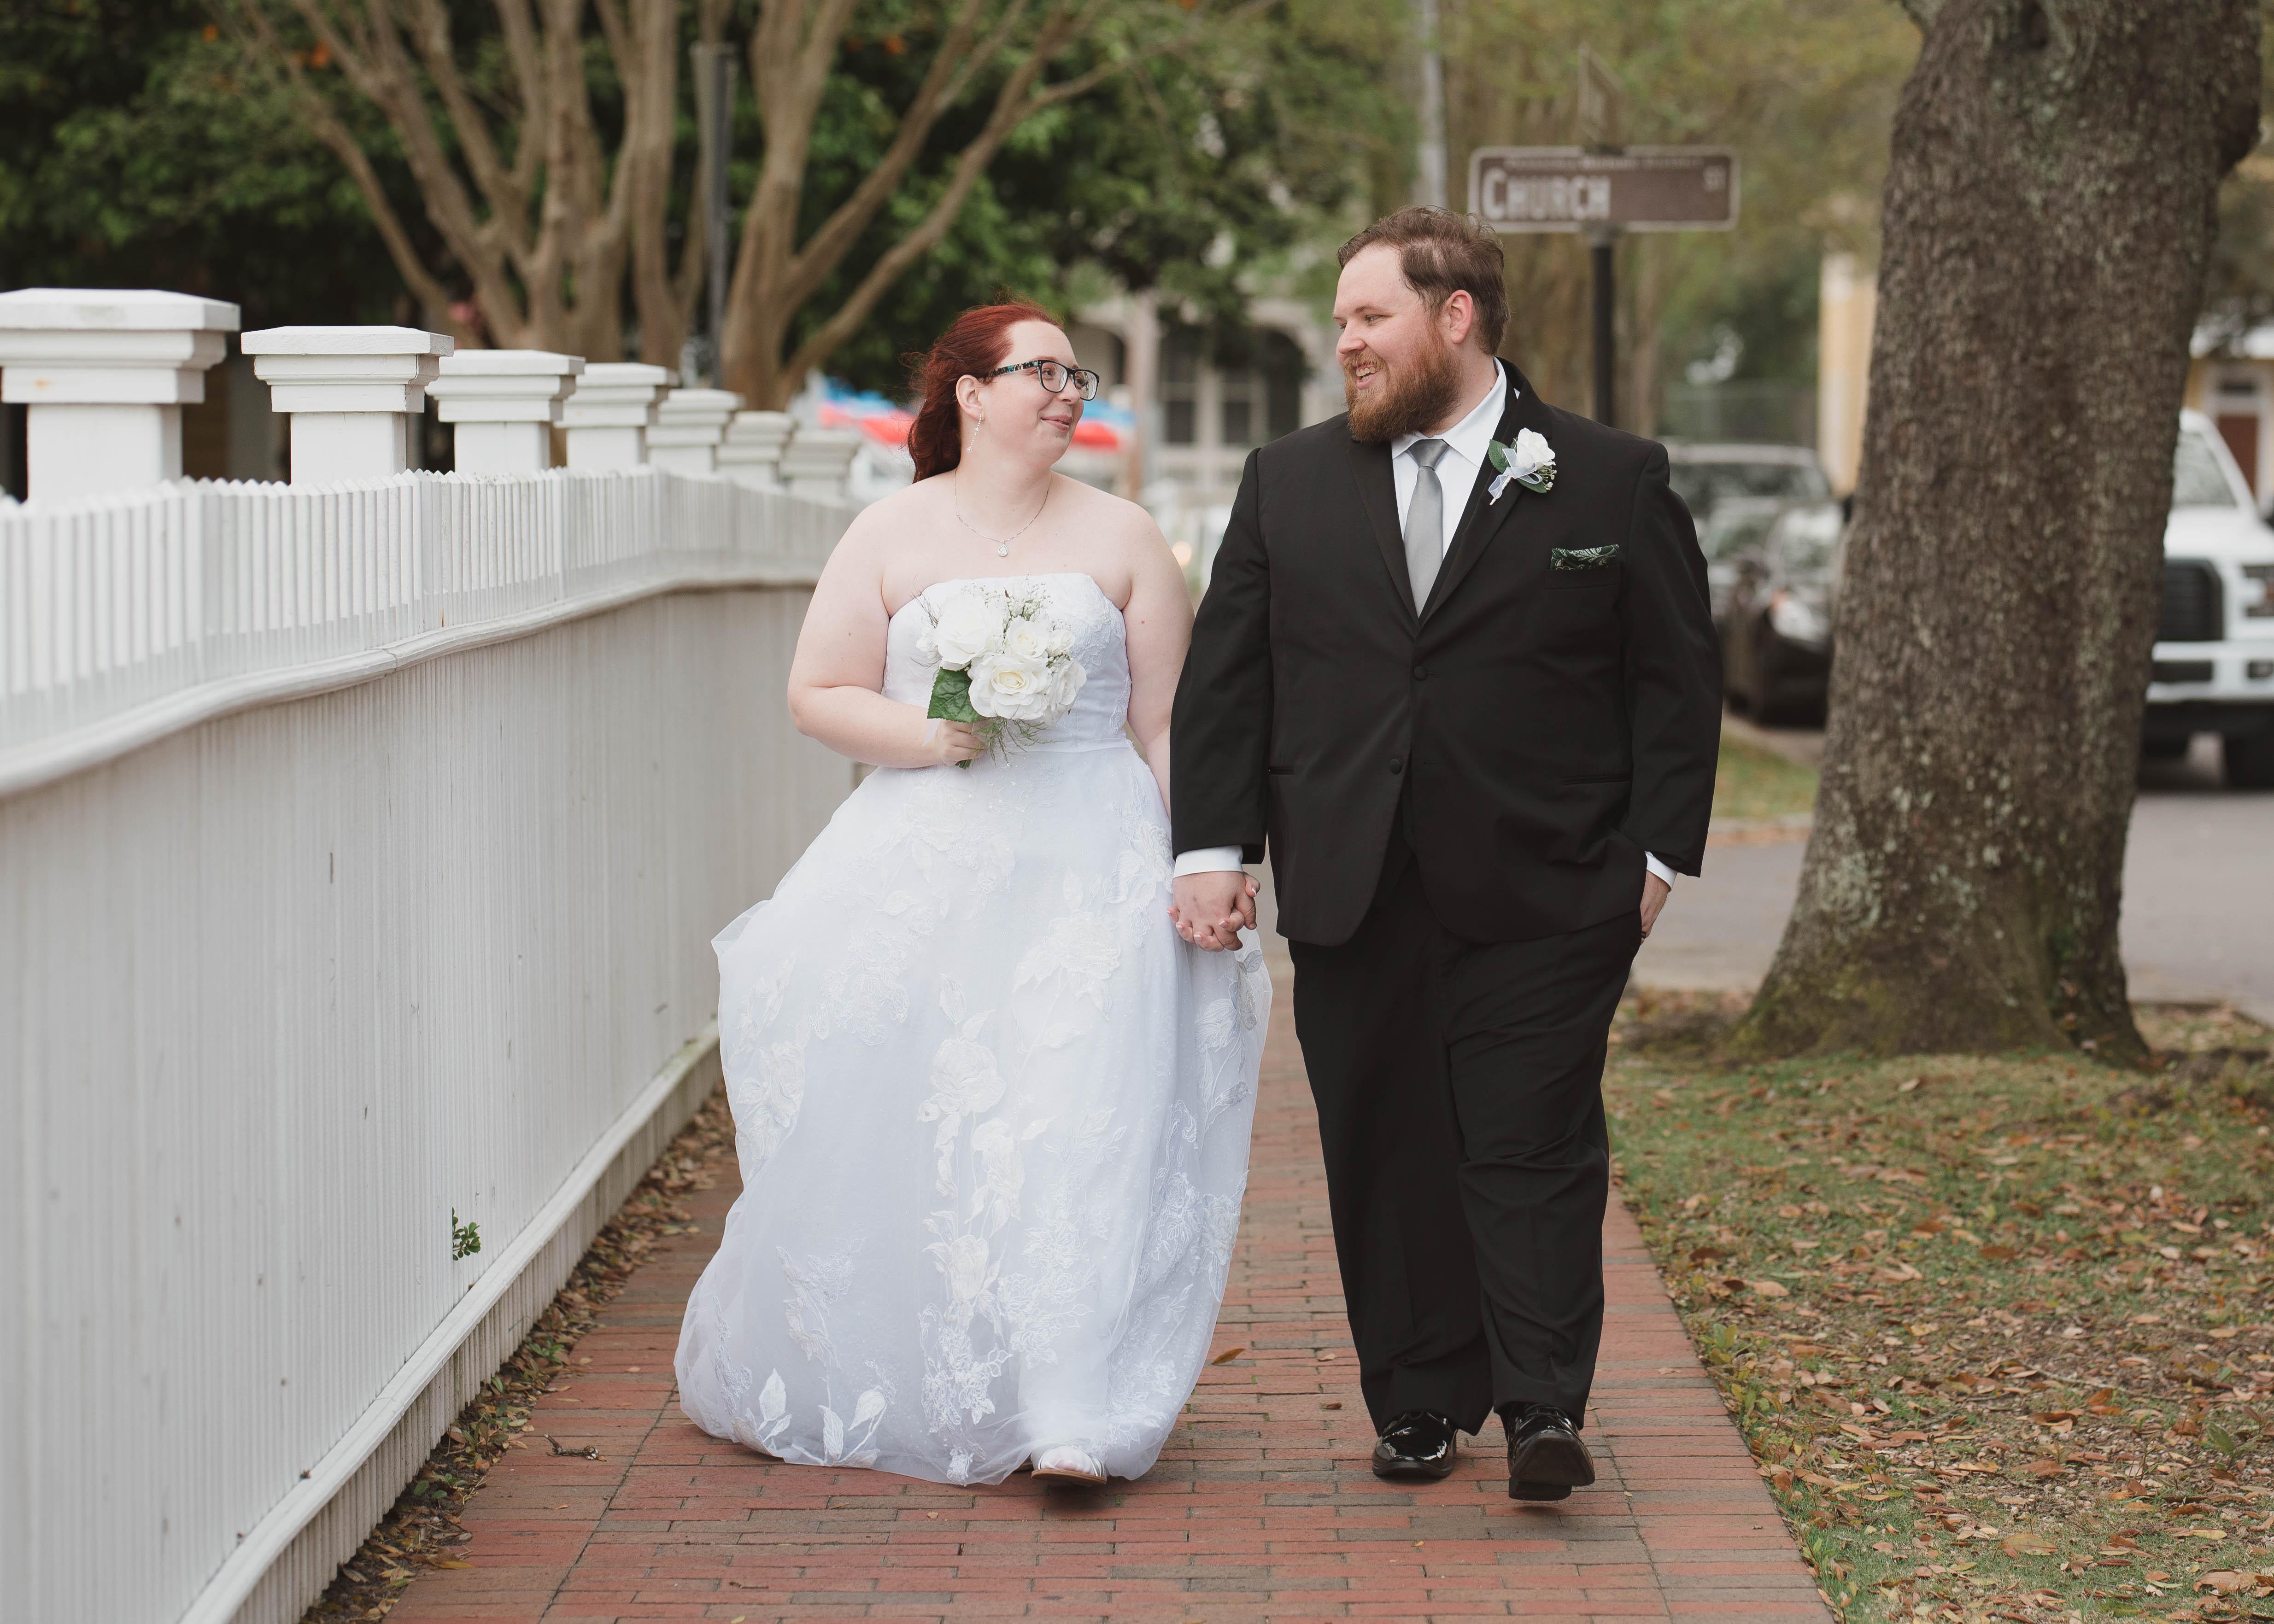 12-Hour Wedding Day